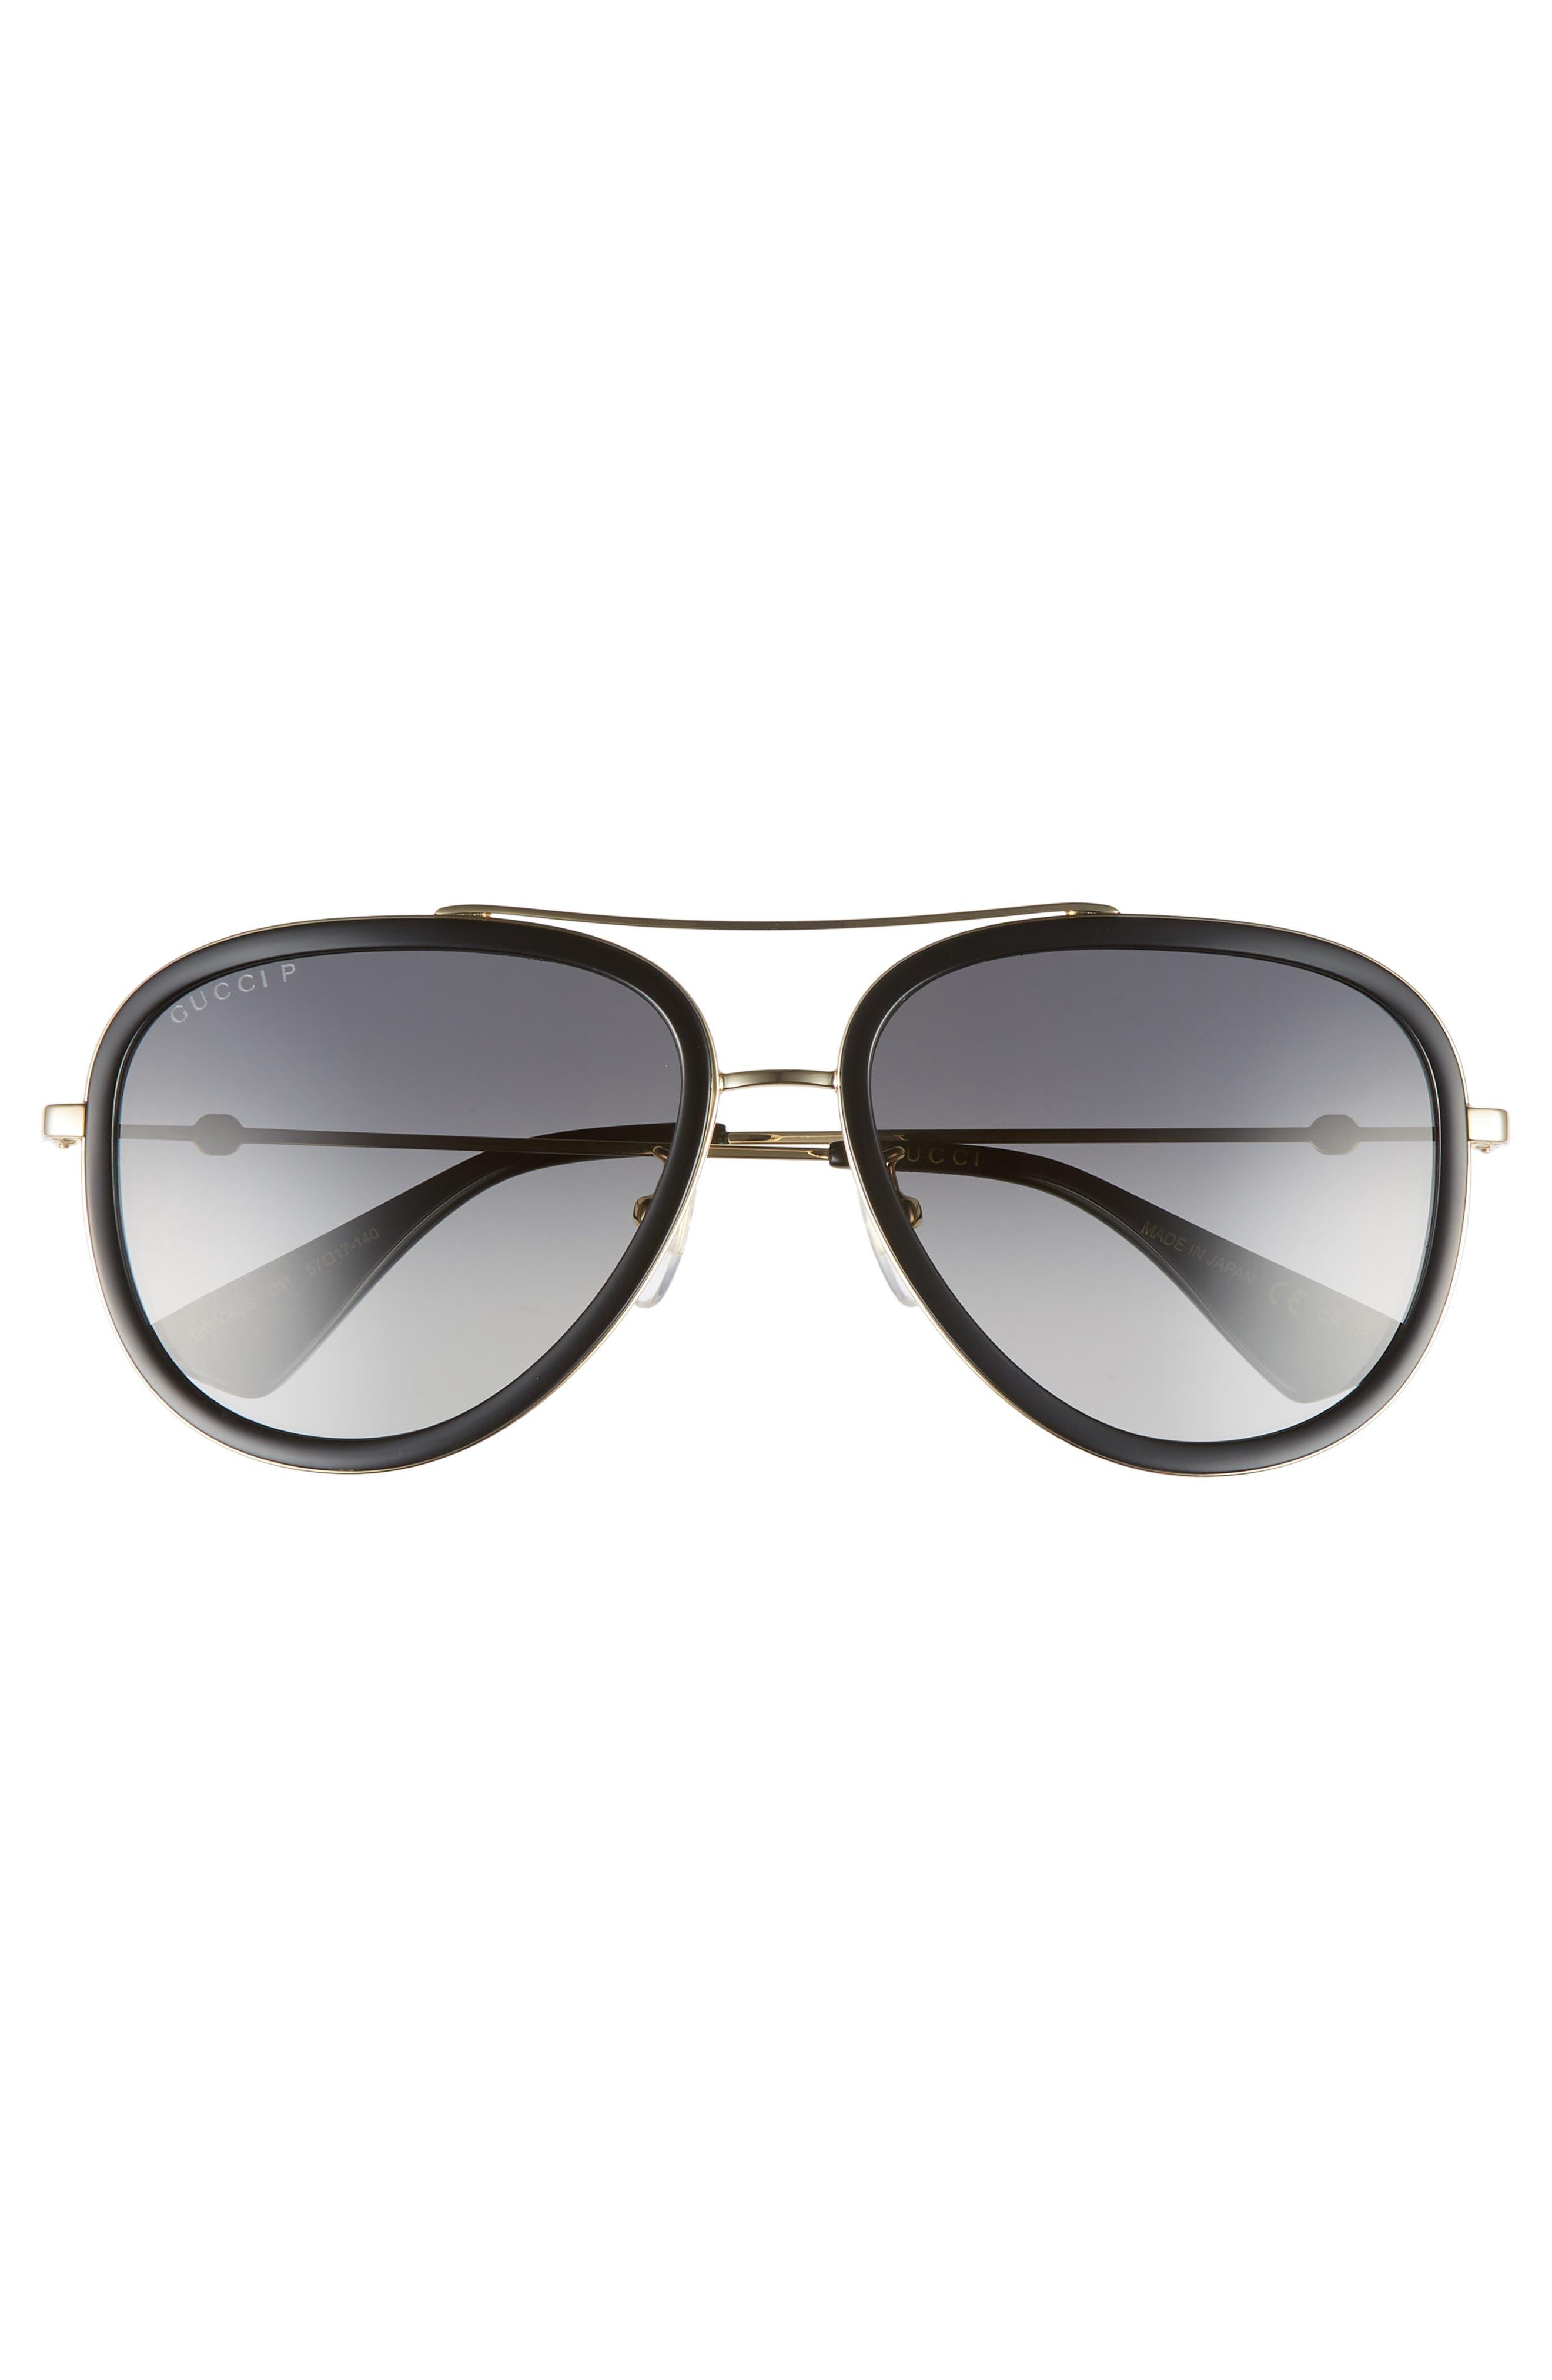 GUCCI, 57mm Polarized Metal Aviator Sunglasses, Alternate thumbnail 3, color, 710